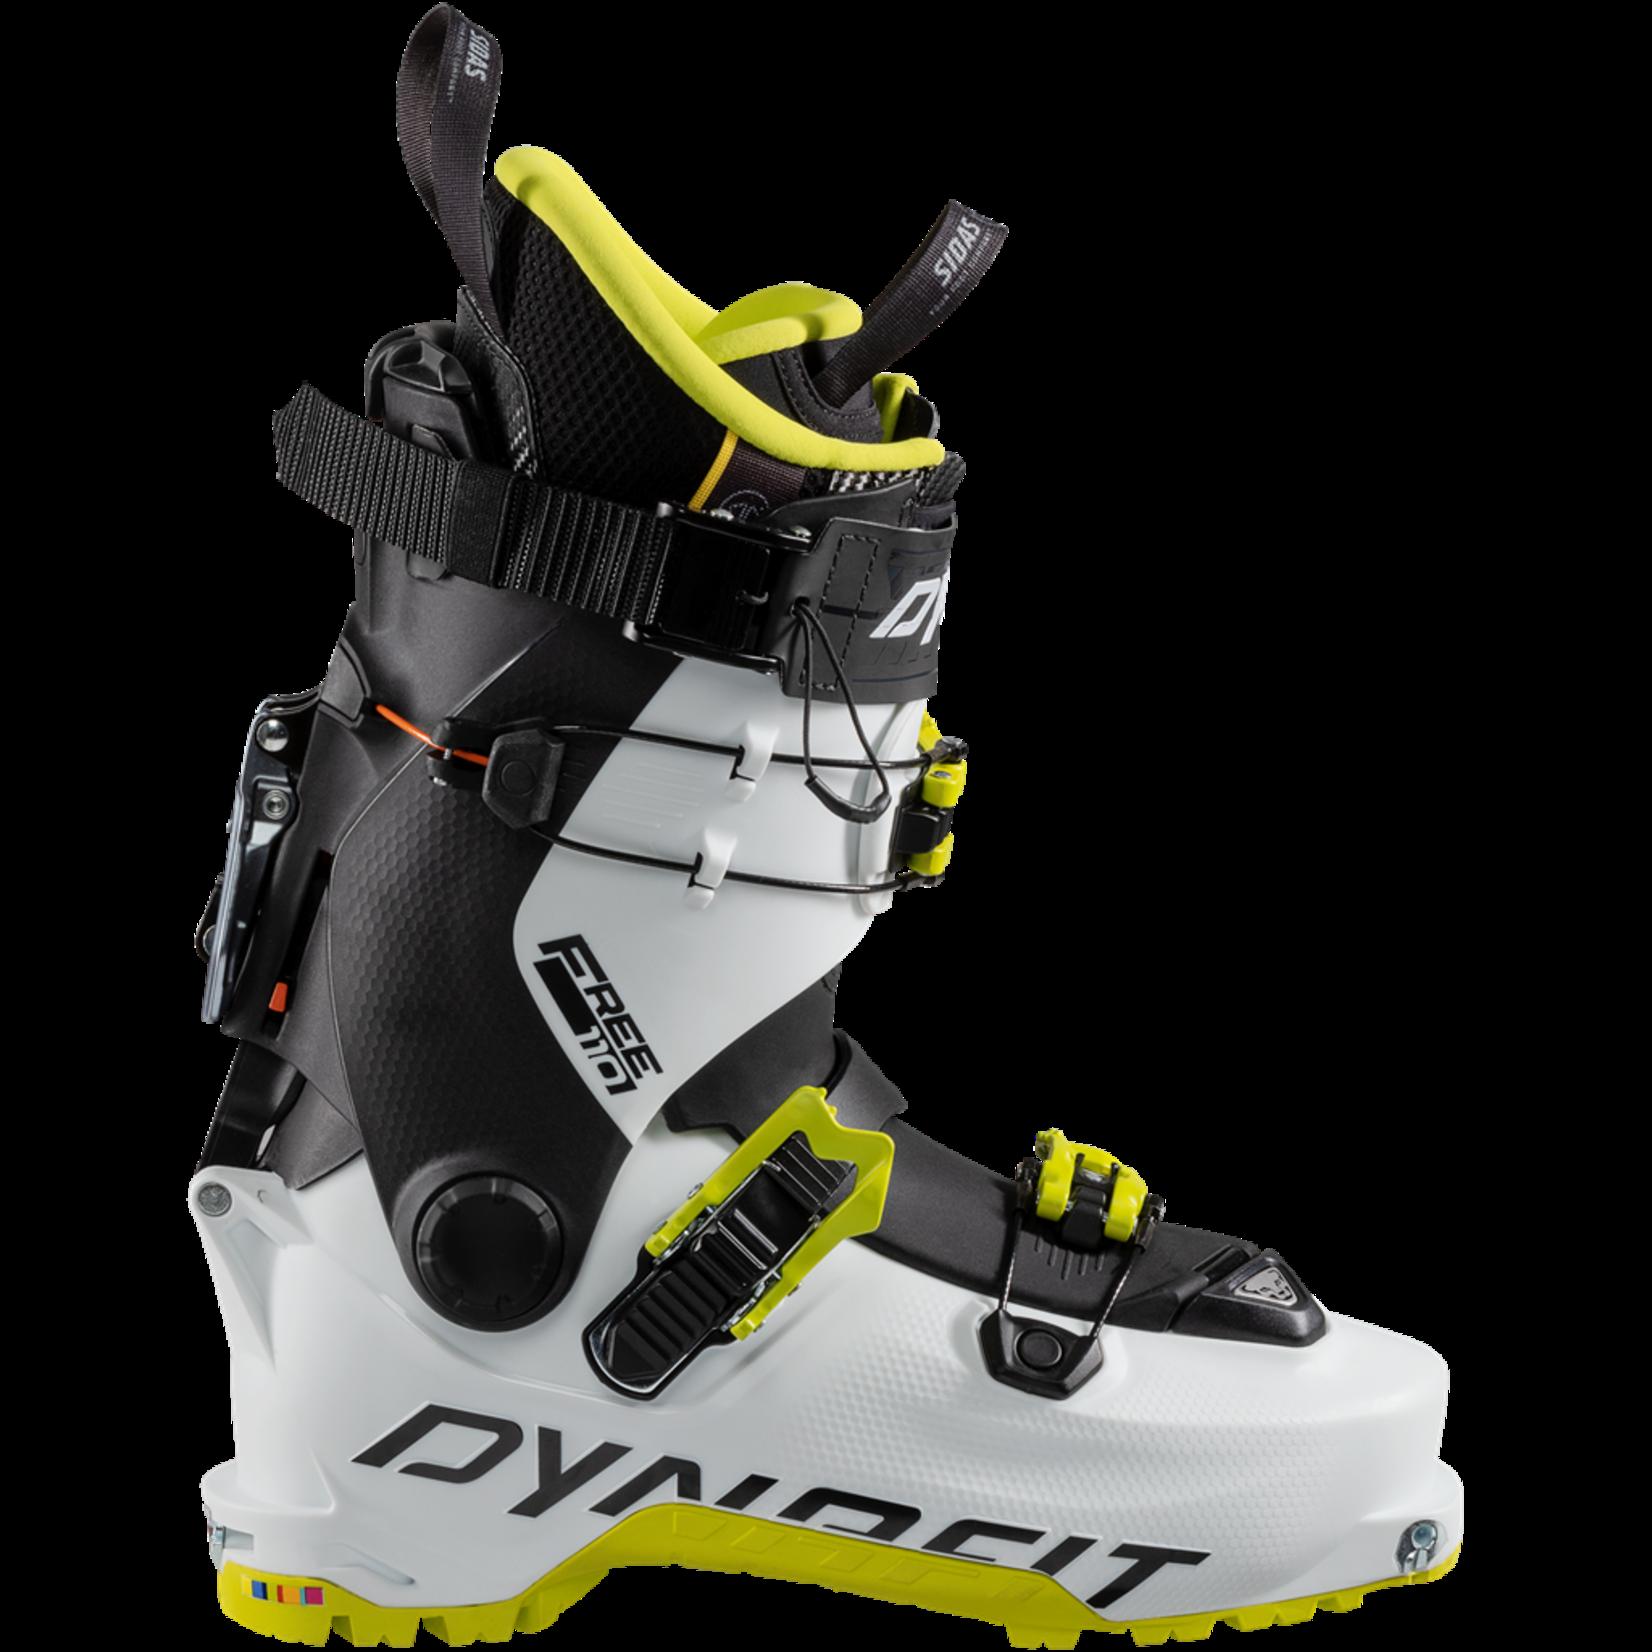 Dynafit Hoji Free 110 Ski Boot